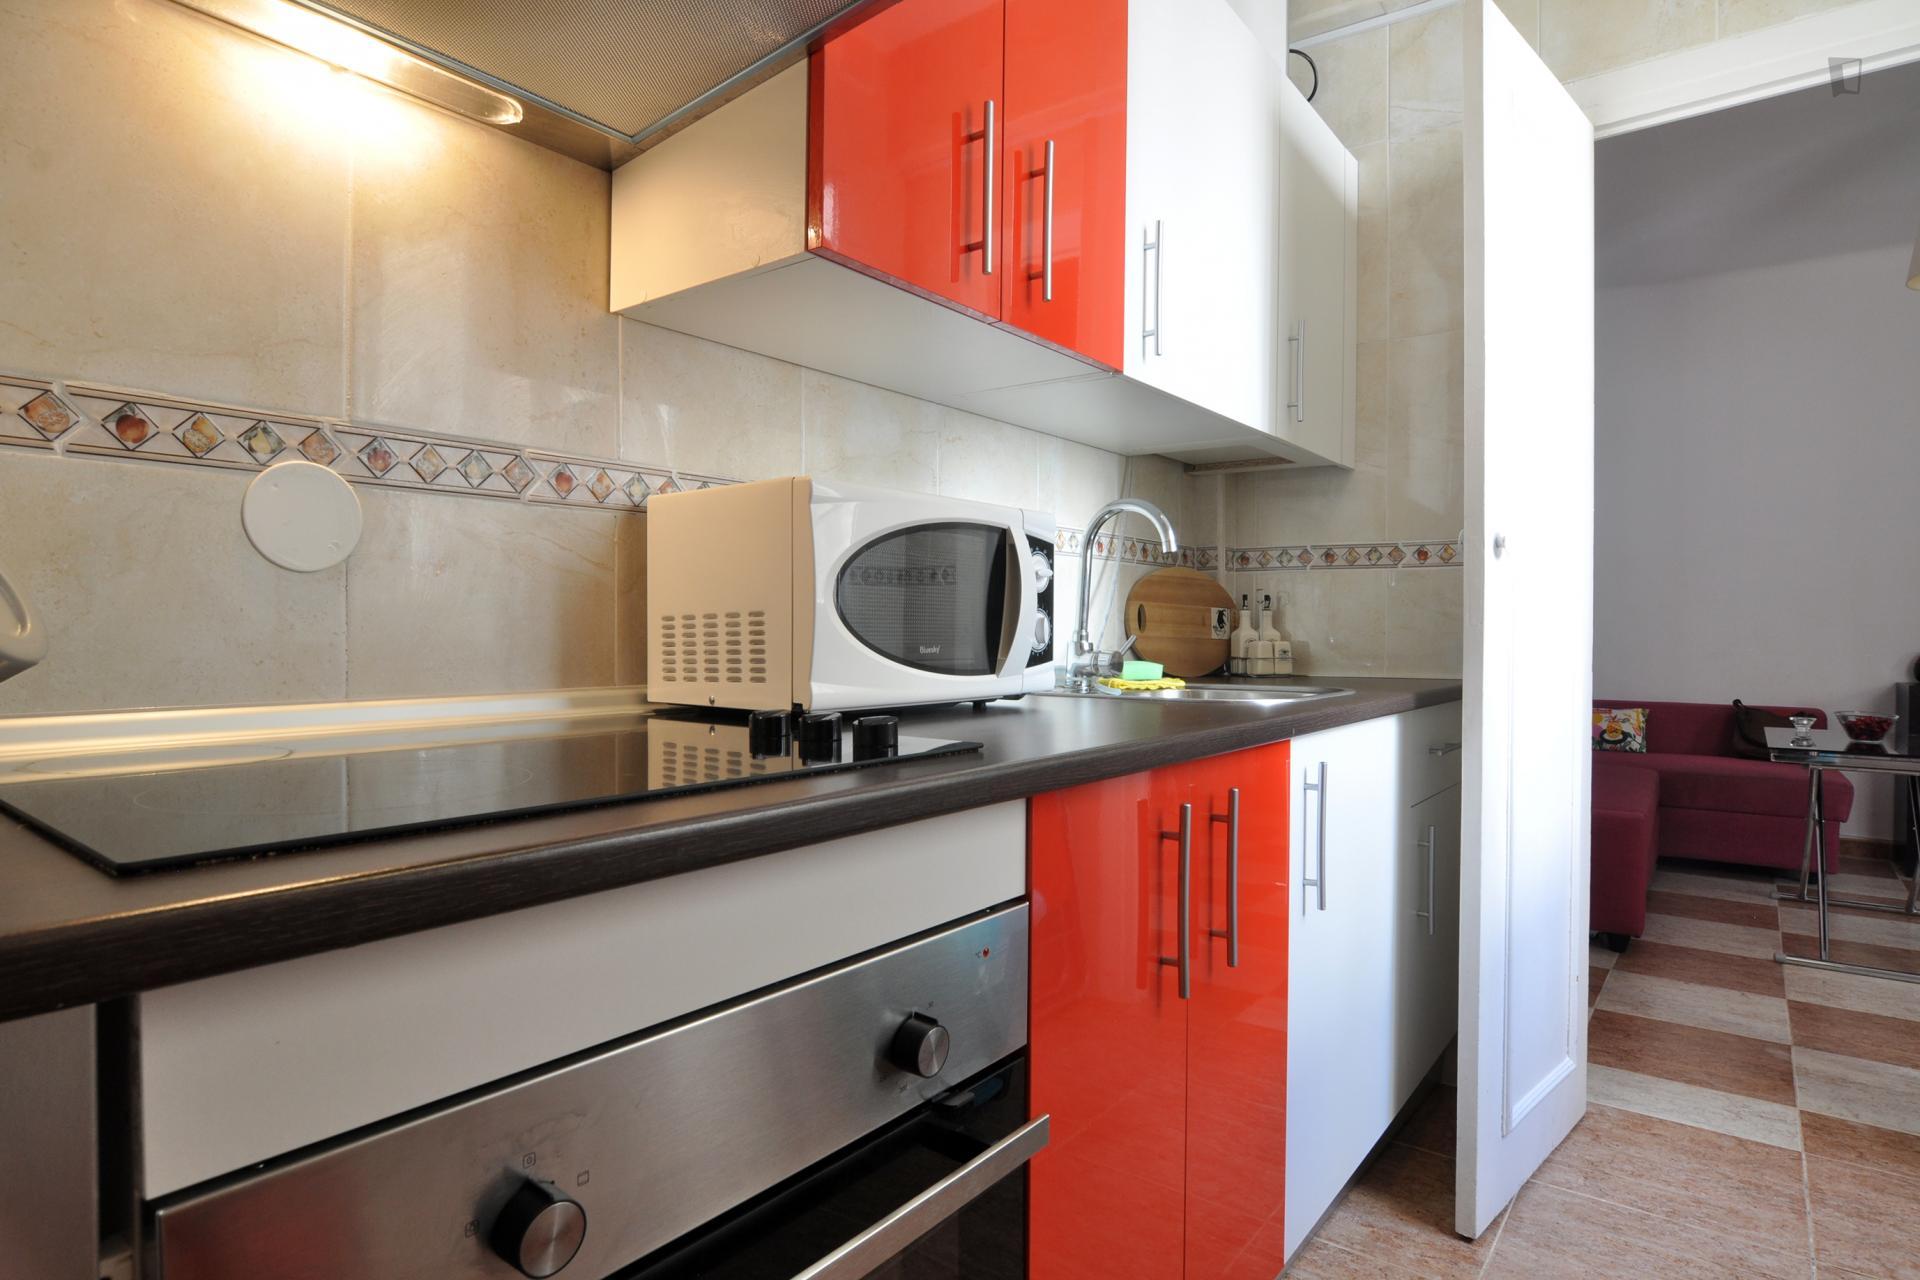 Mariana- Nice Student housing in Malaga